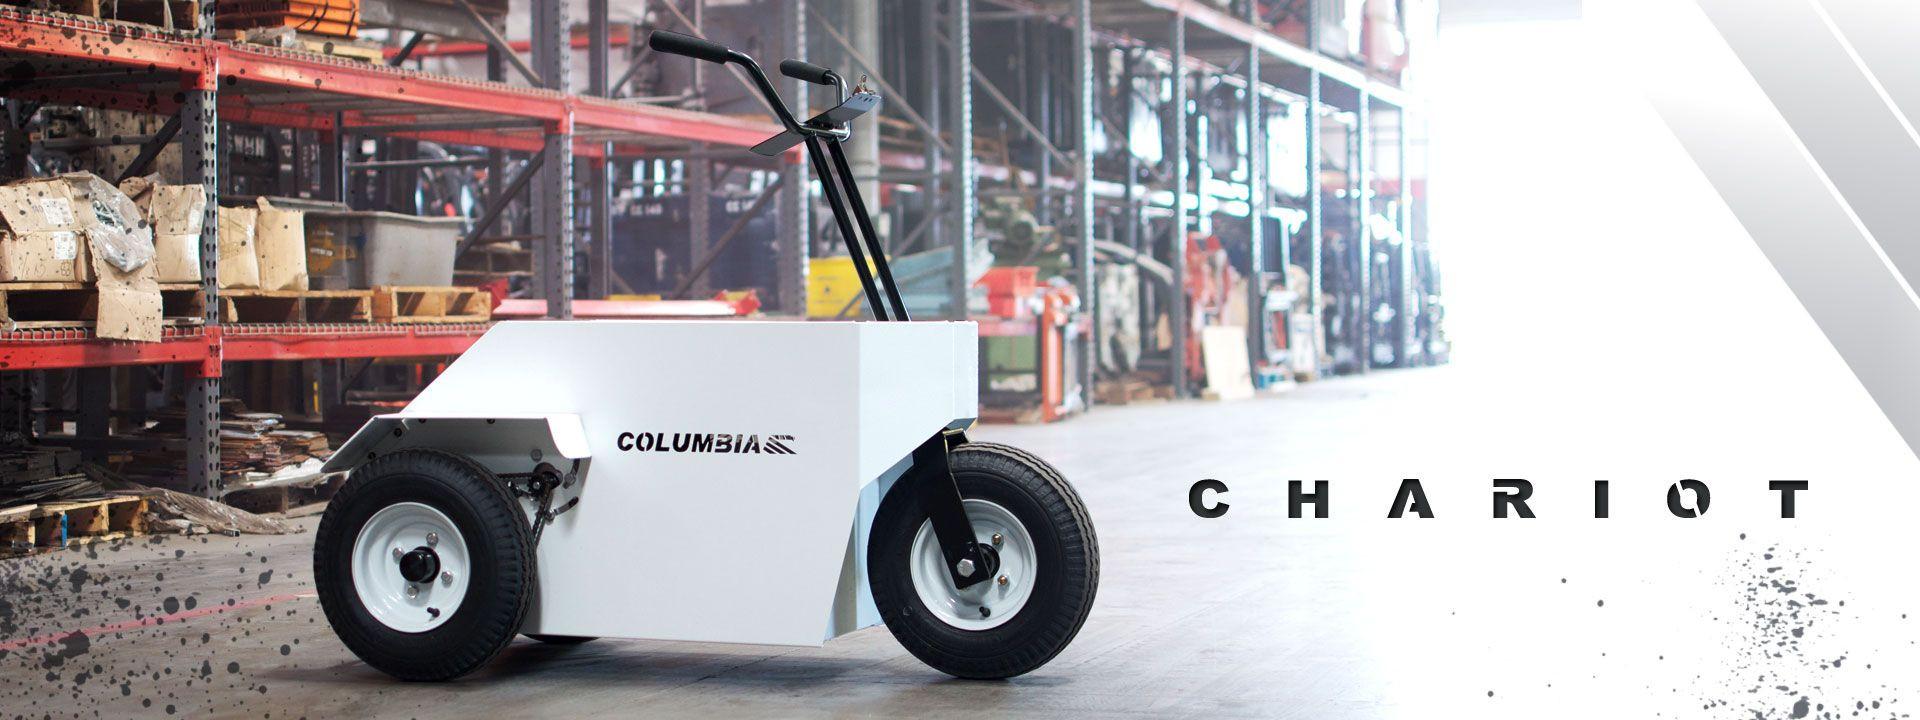 White Columbia Chariot